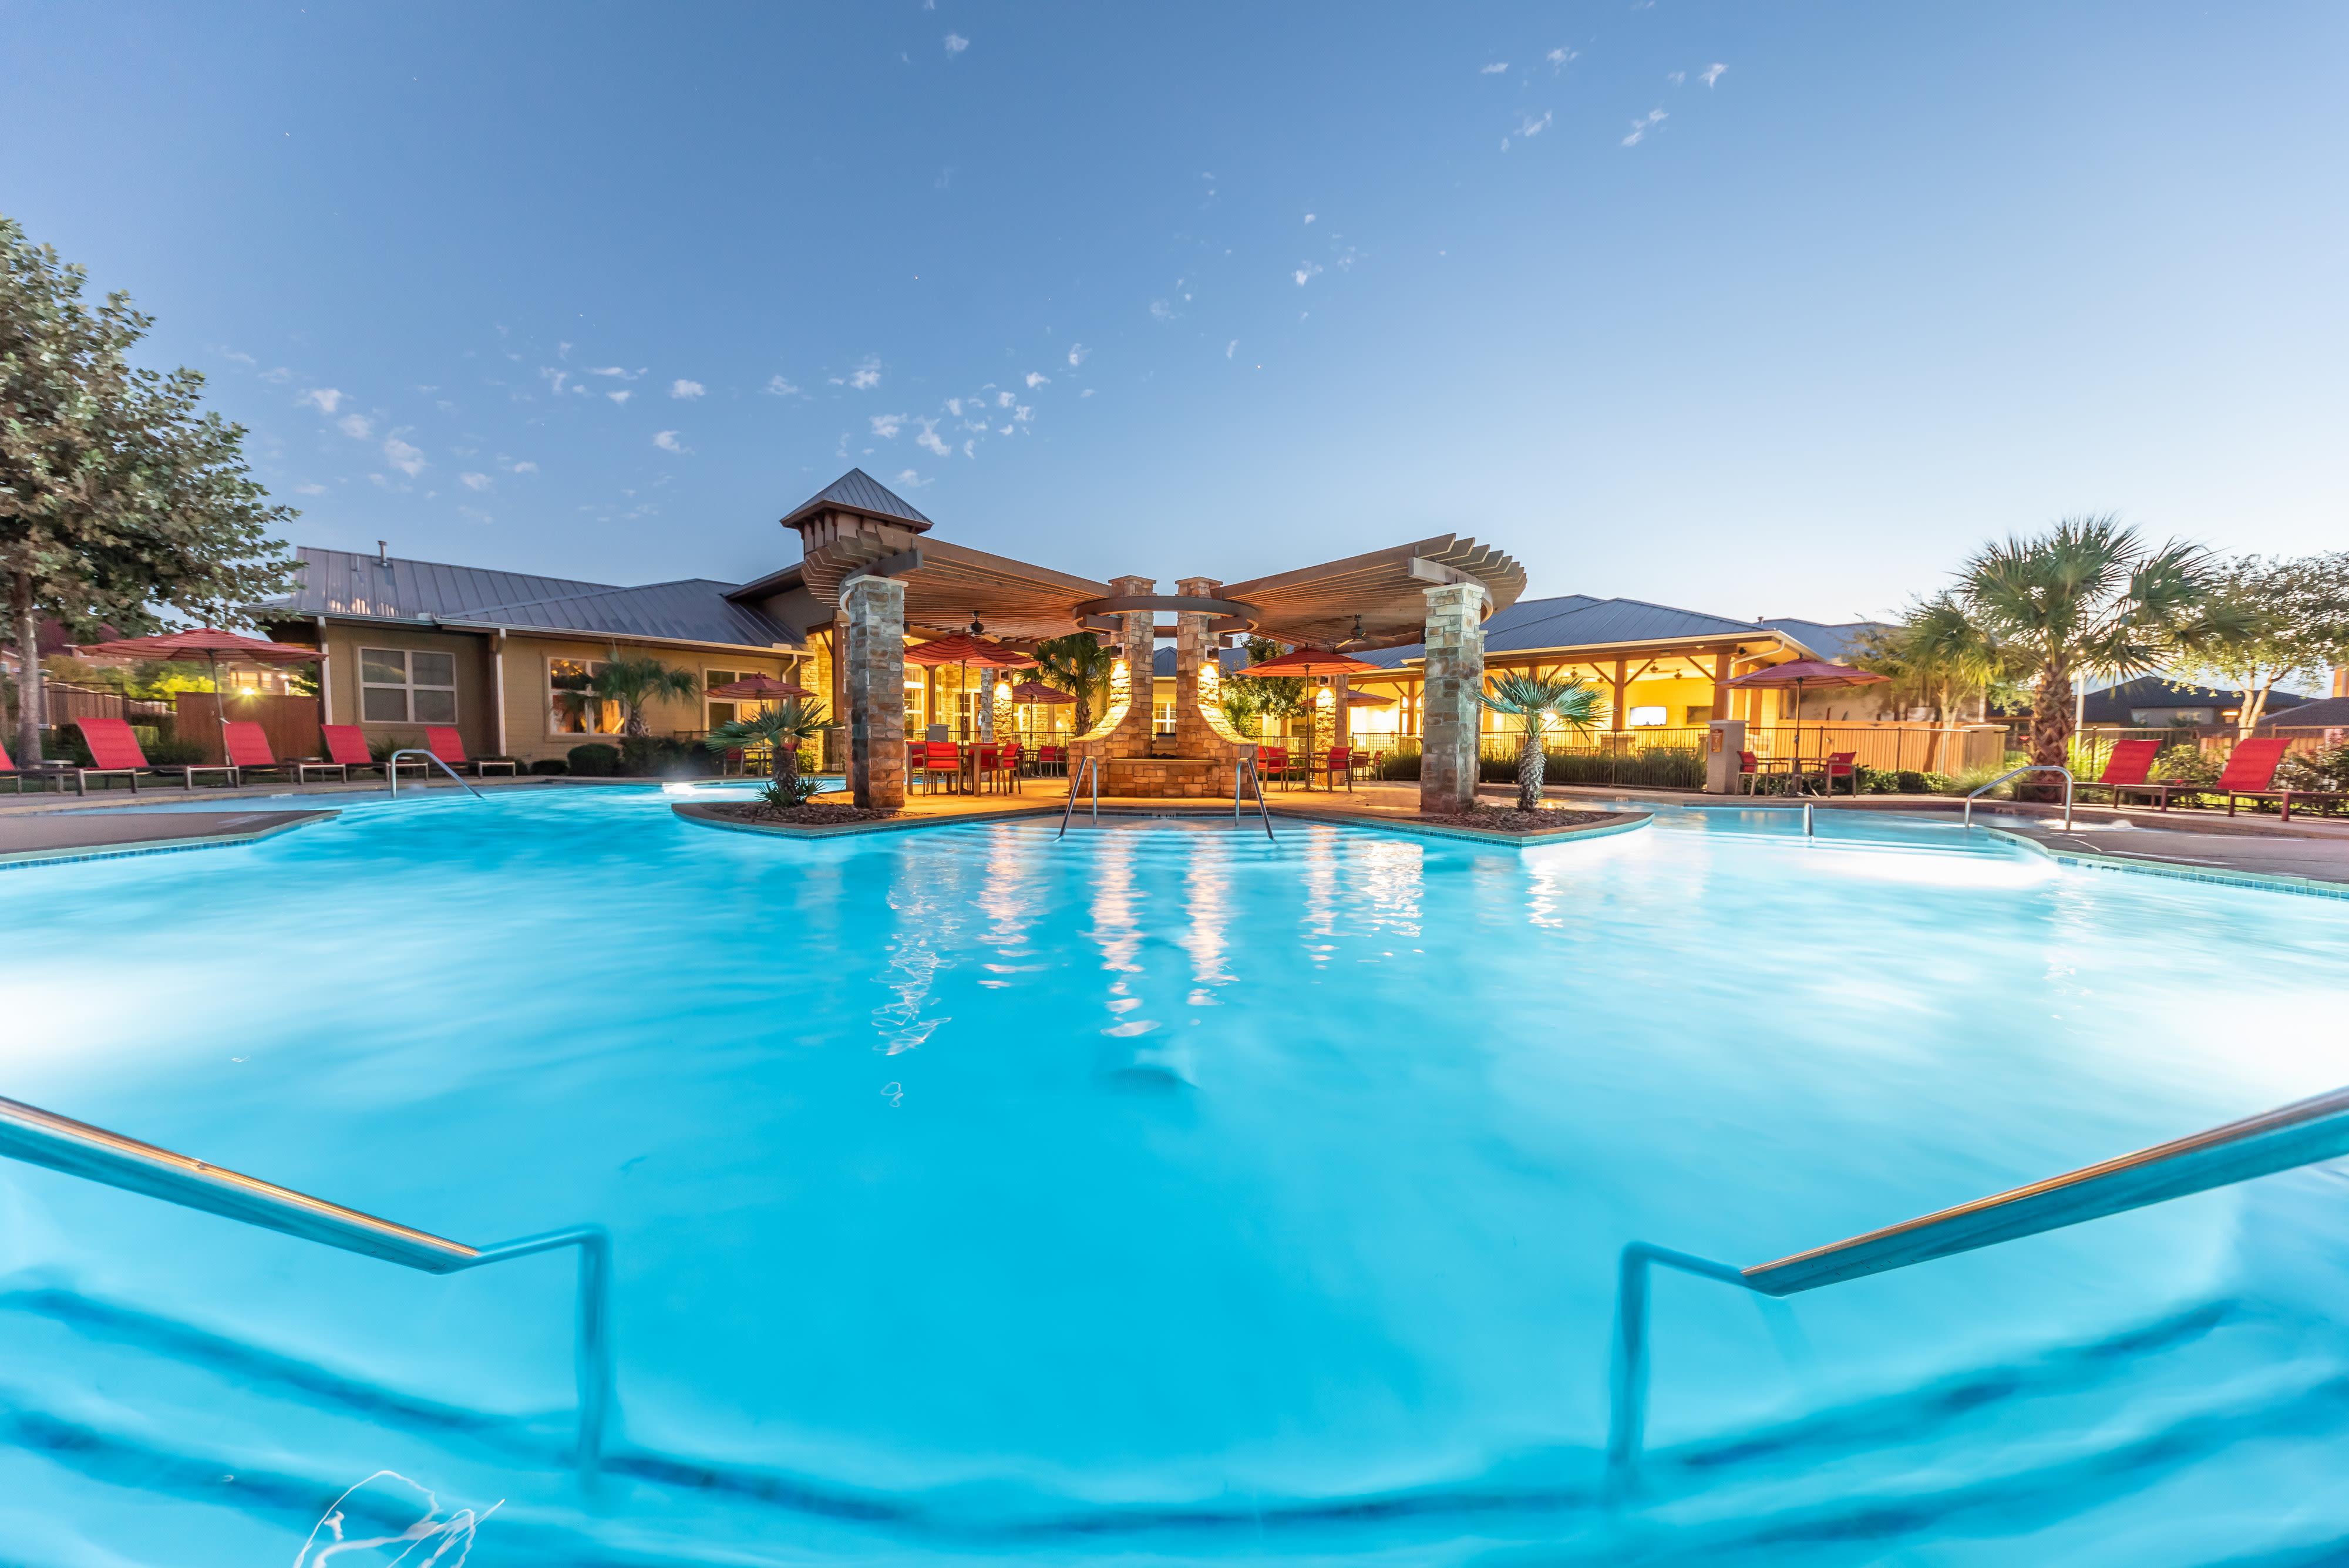 Outdoor pool at dusk at Firewheel Apartments in San Antonio